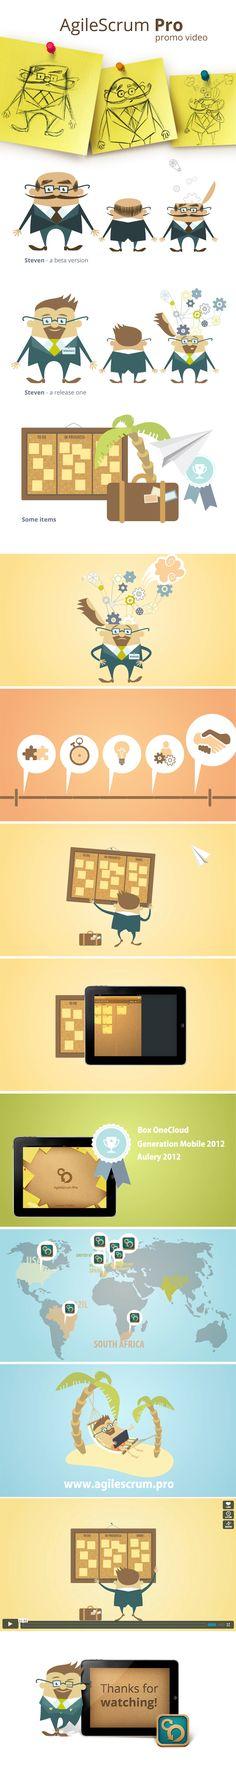 #AgileScrum Pro making of #promo video #presentation #iPad #Scrum #App